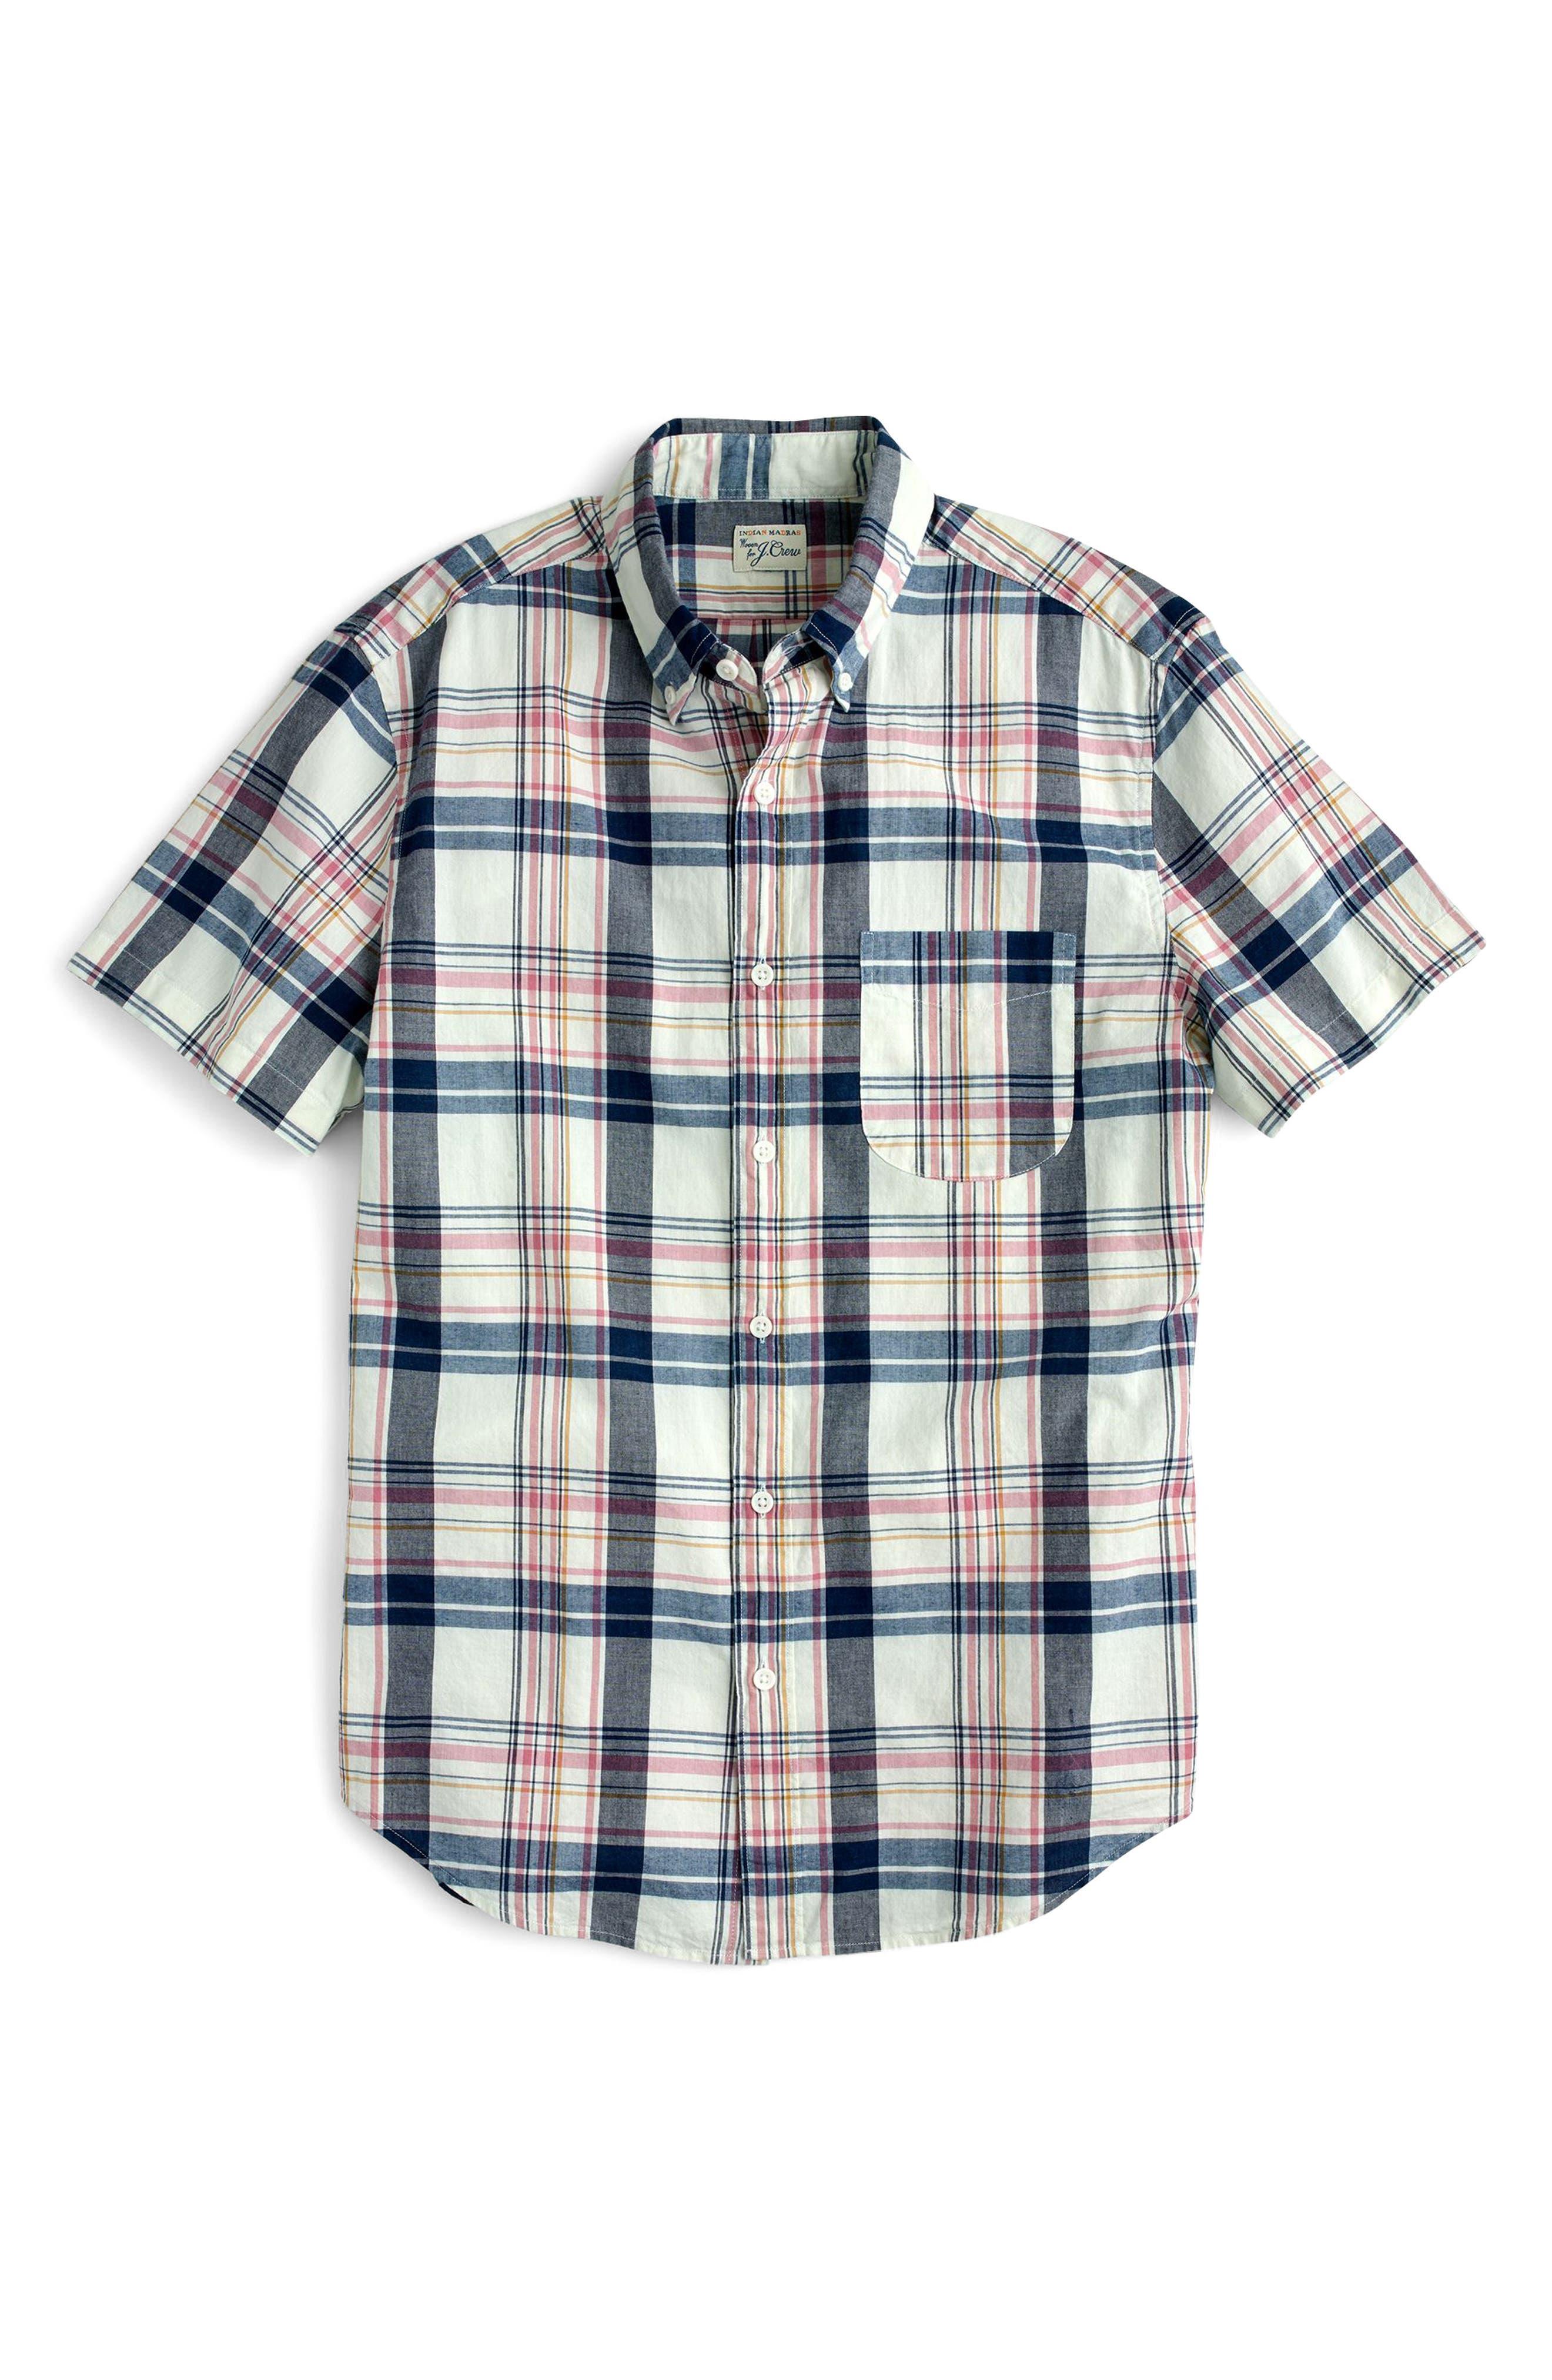 Indigo Plaid Short Sleeve Madras Shirt,                             Alternate thumbnail 4, color,